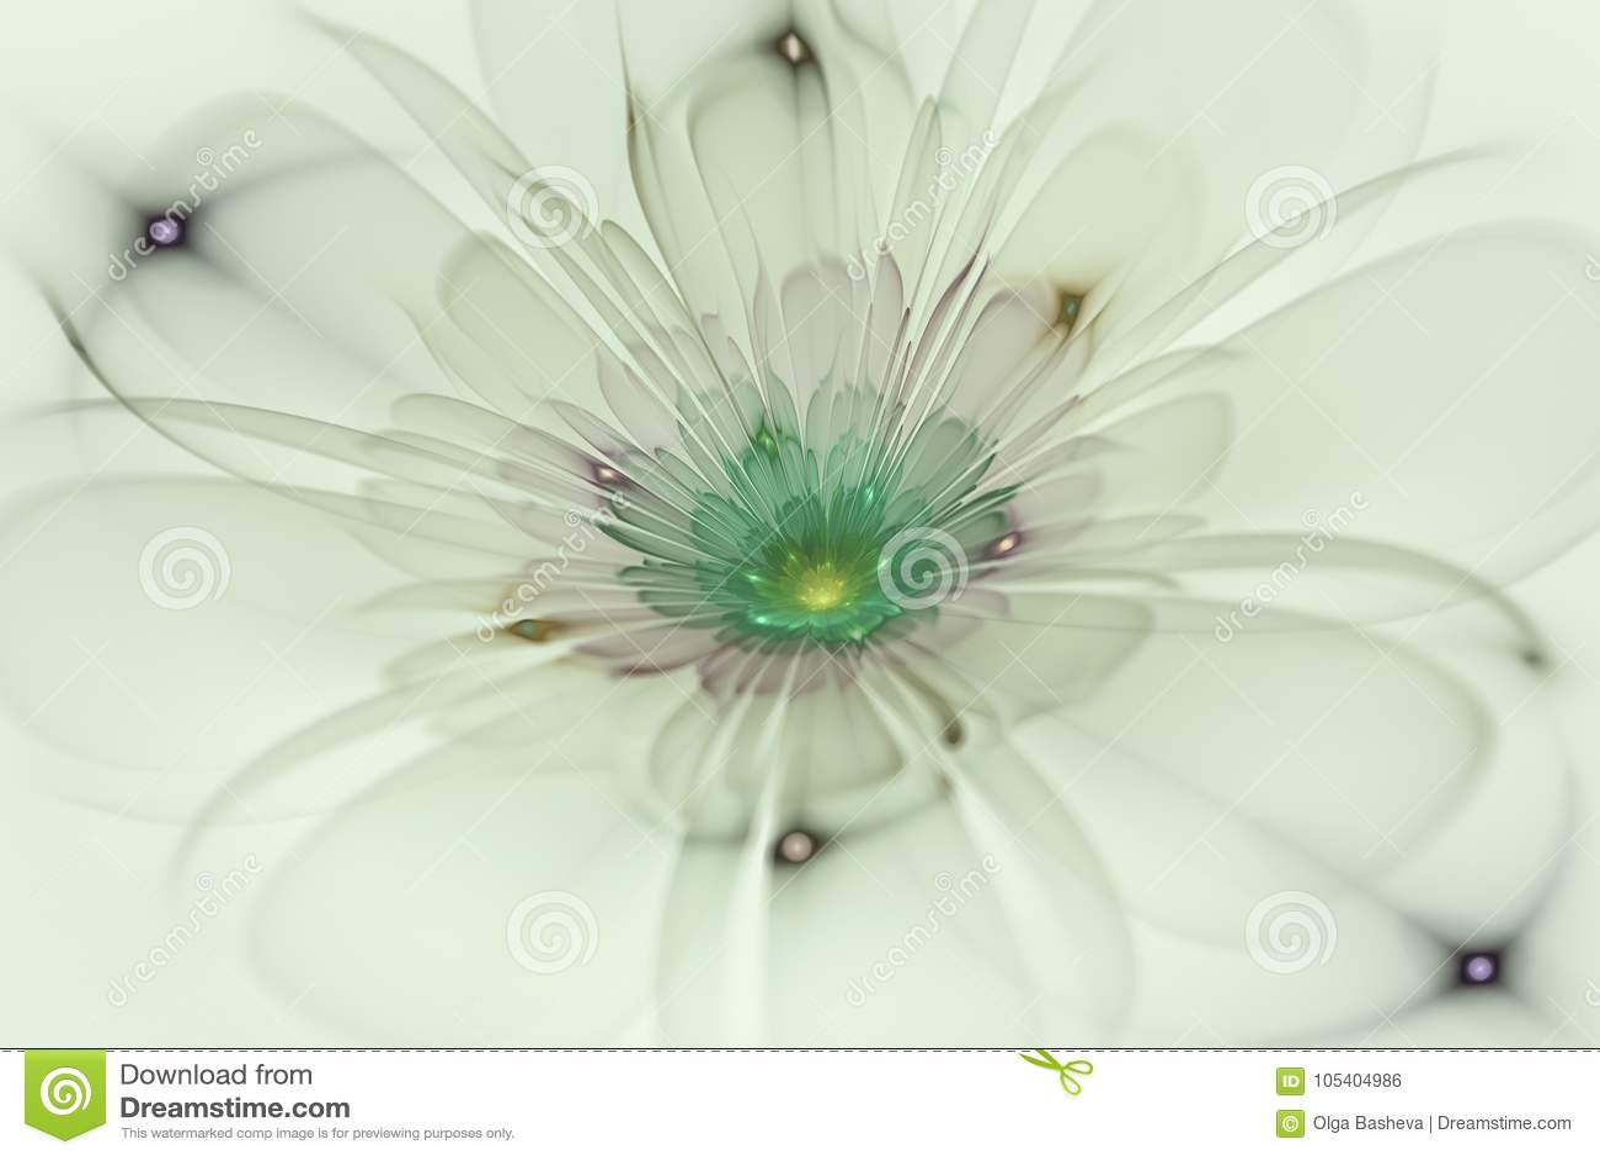 Download Αφηρημένη Fractal παραγμένη υπολογιστής εικόνα λουλουδιών Απεικόνιση αποθεμάτων - εικονογραφία από μορφή, ενέργεια: 105404986